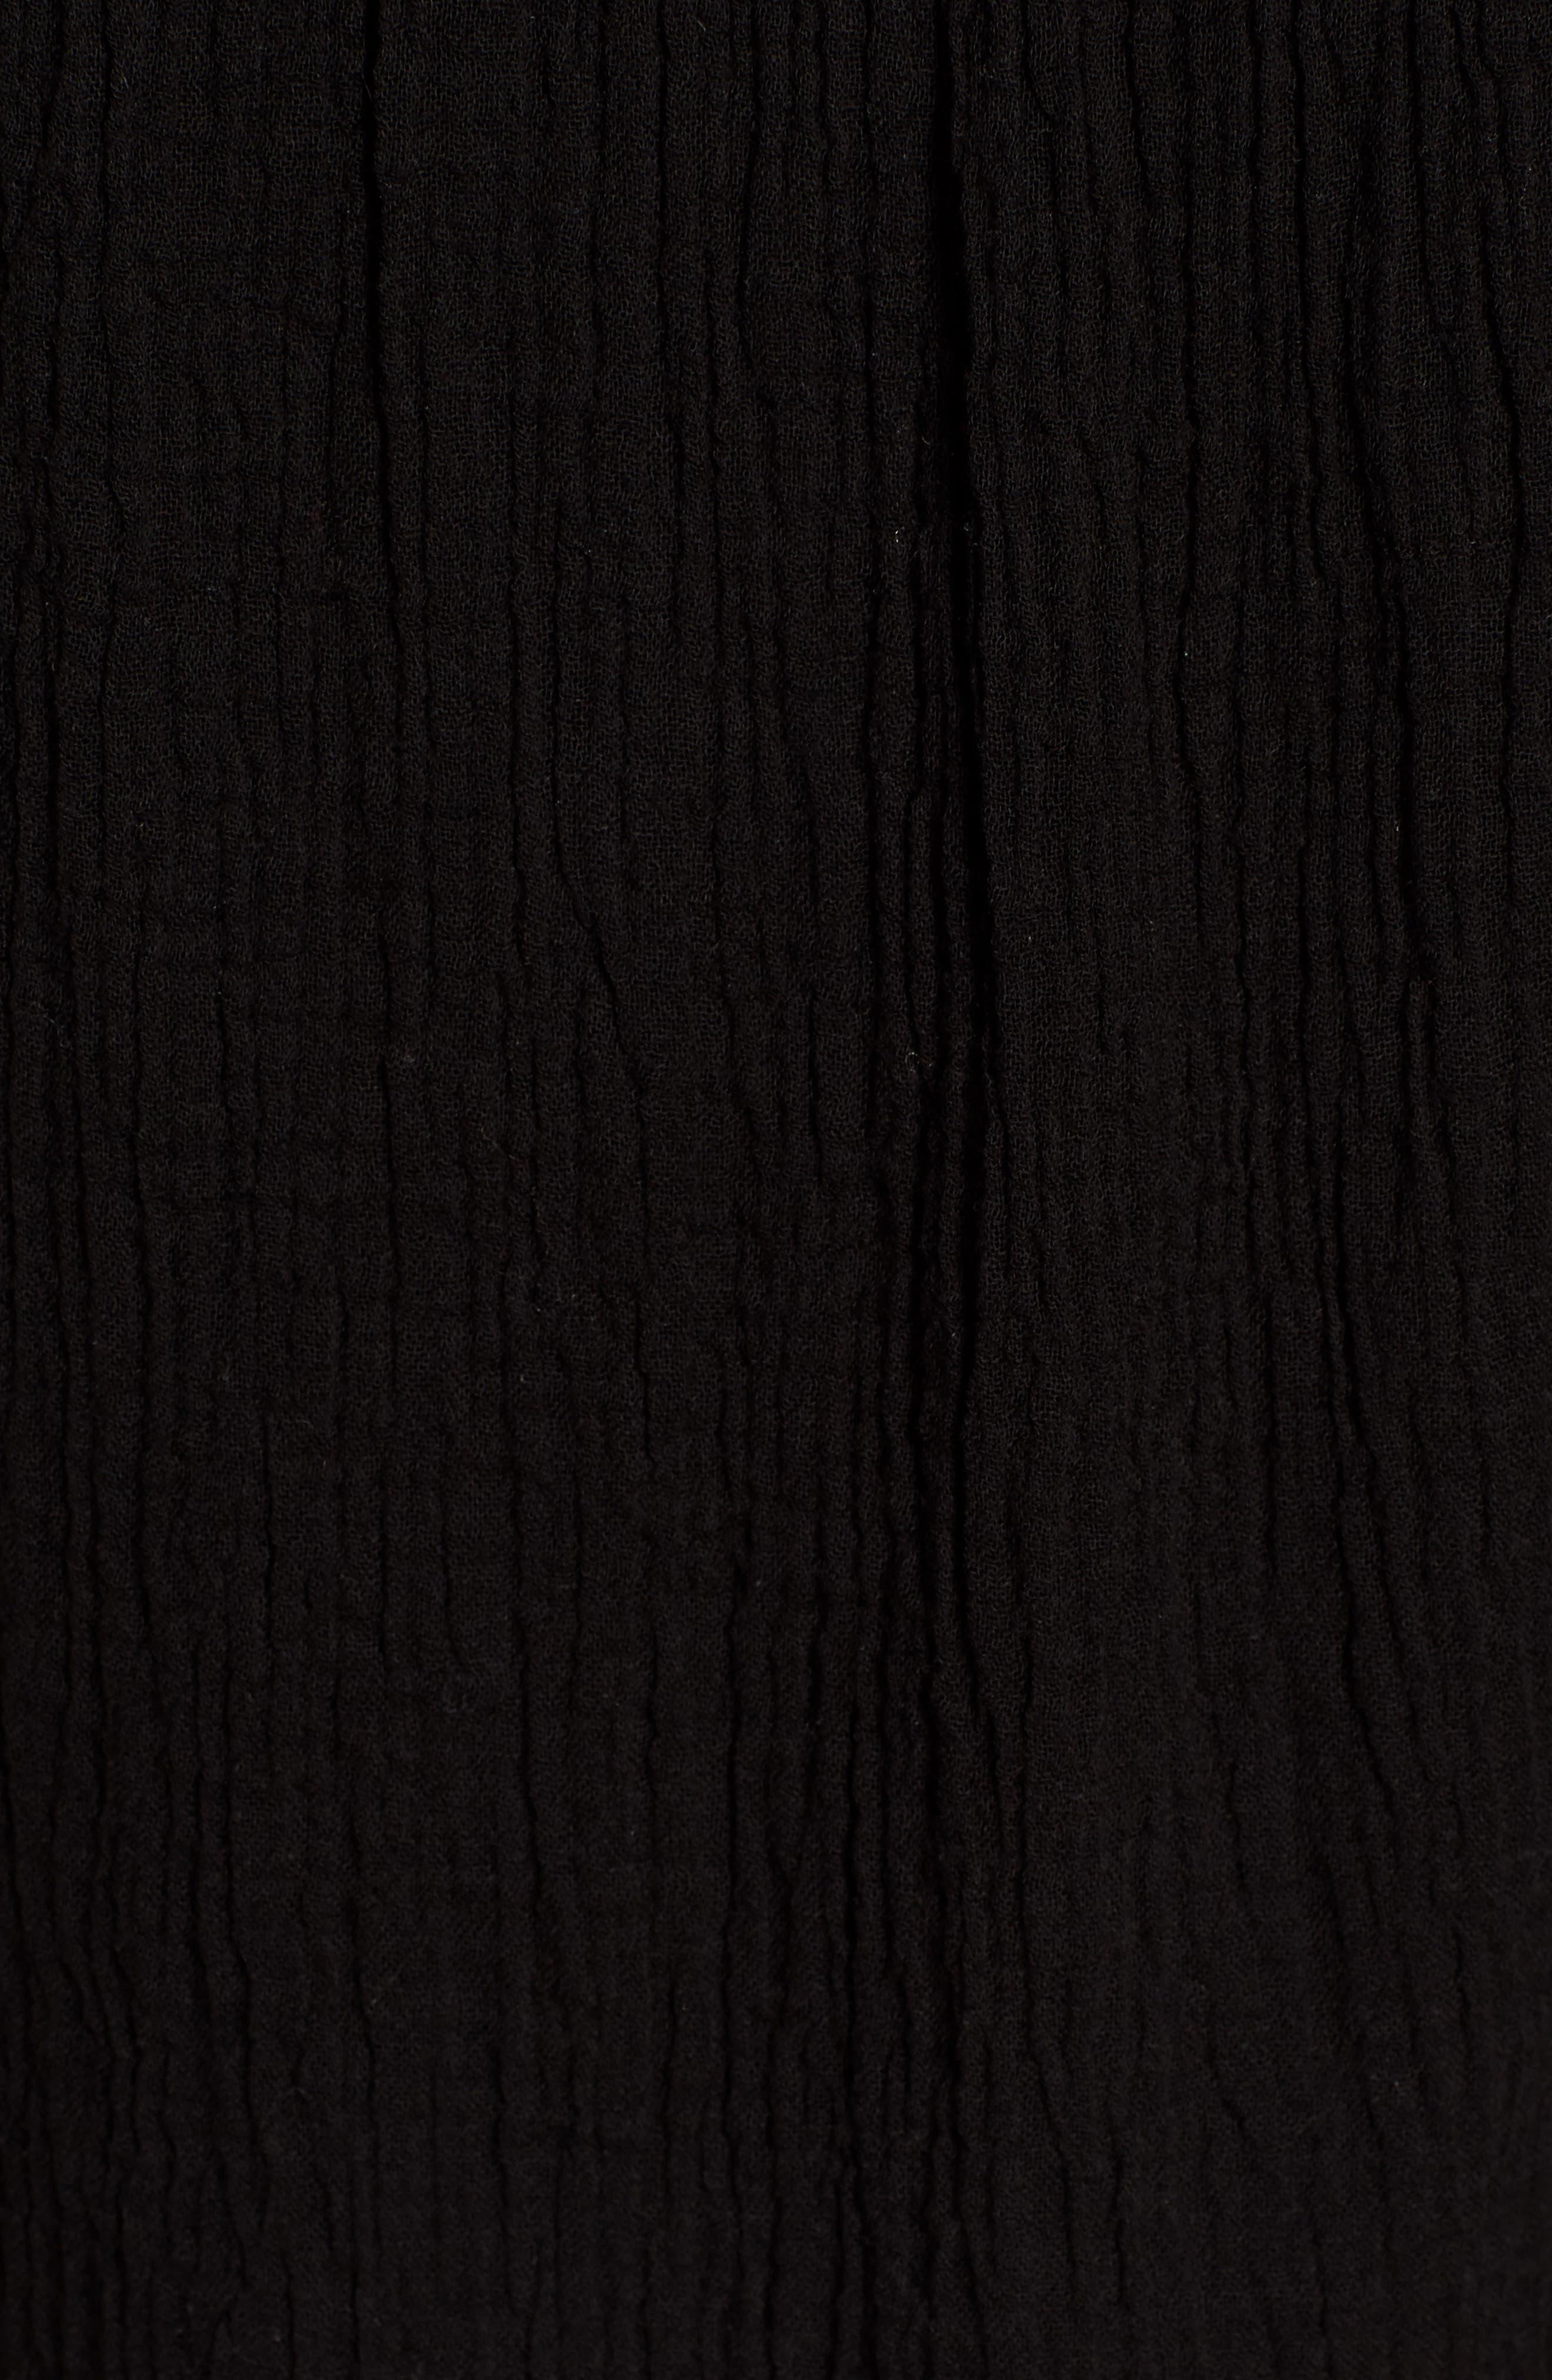 Cutout Sleeve Top,                             Alternate thumbnail 6, color,                             001